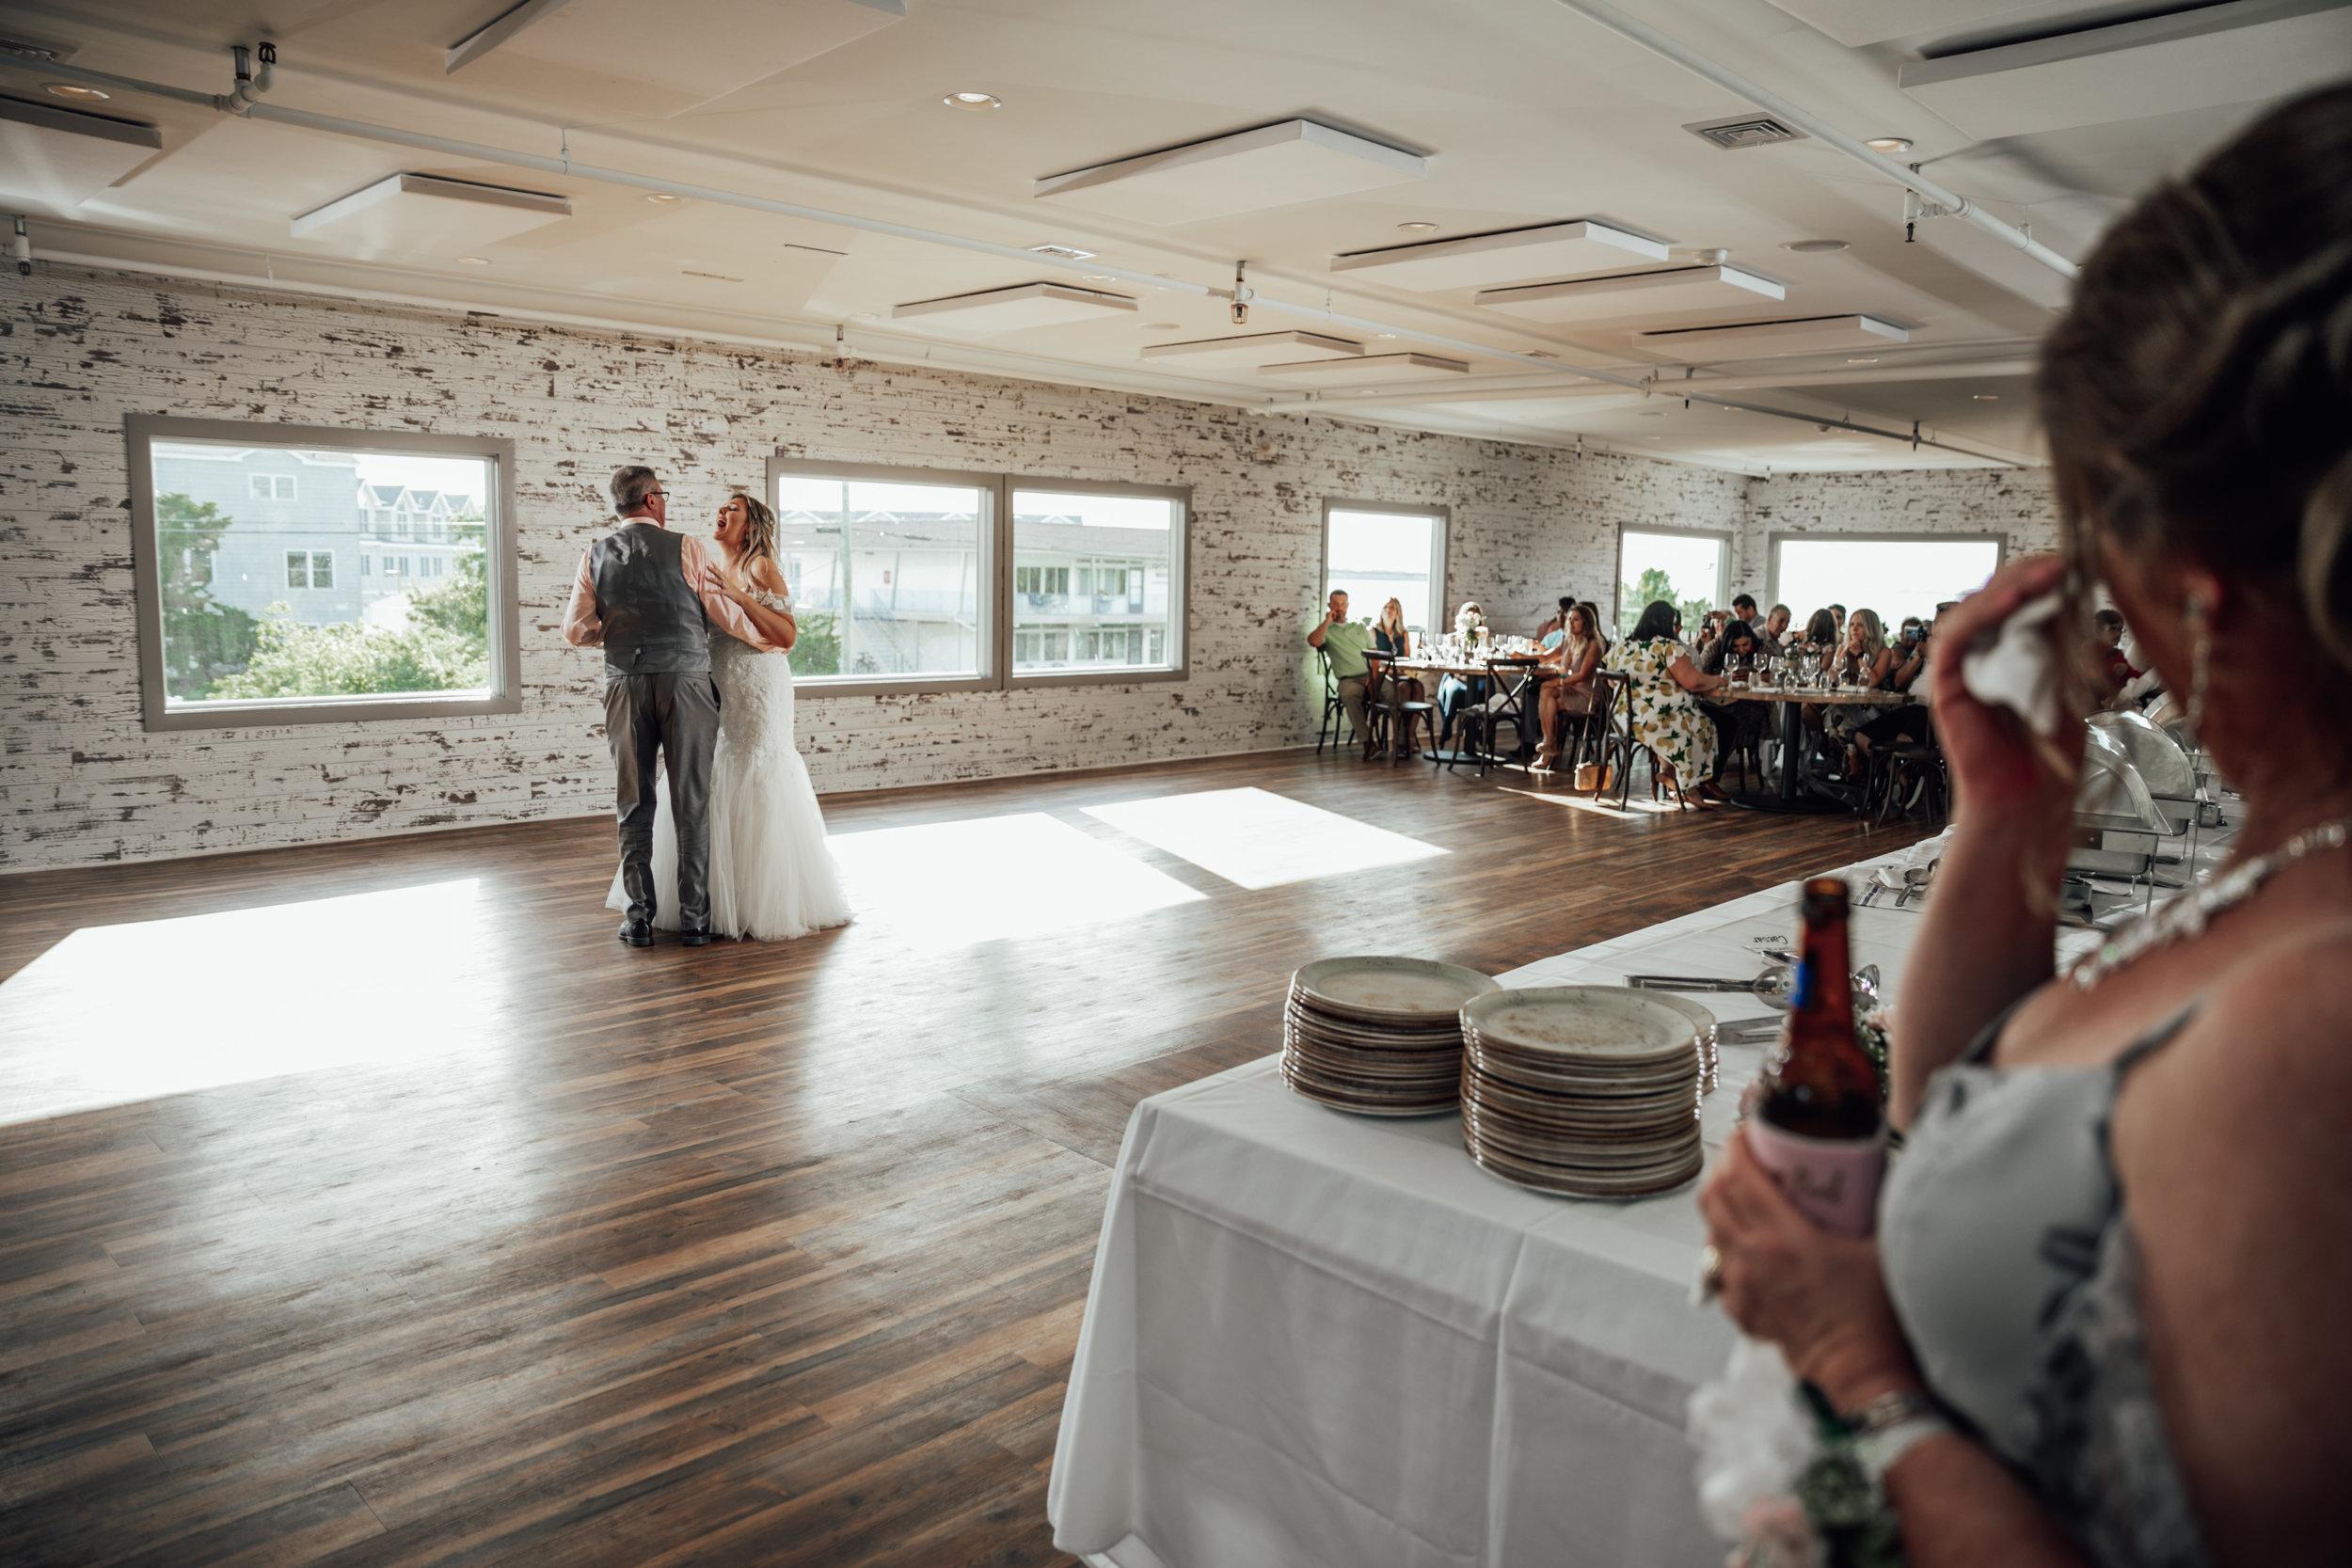 New Jersey Wedding Photographer, Felsberg Photography LBI wedding photography 96.jpg